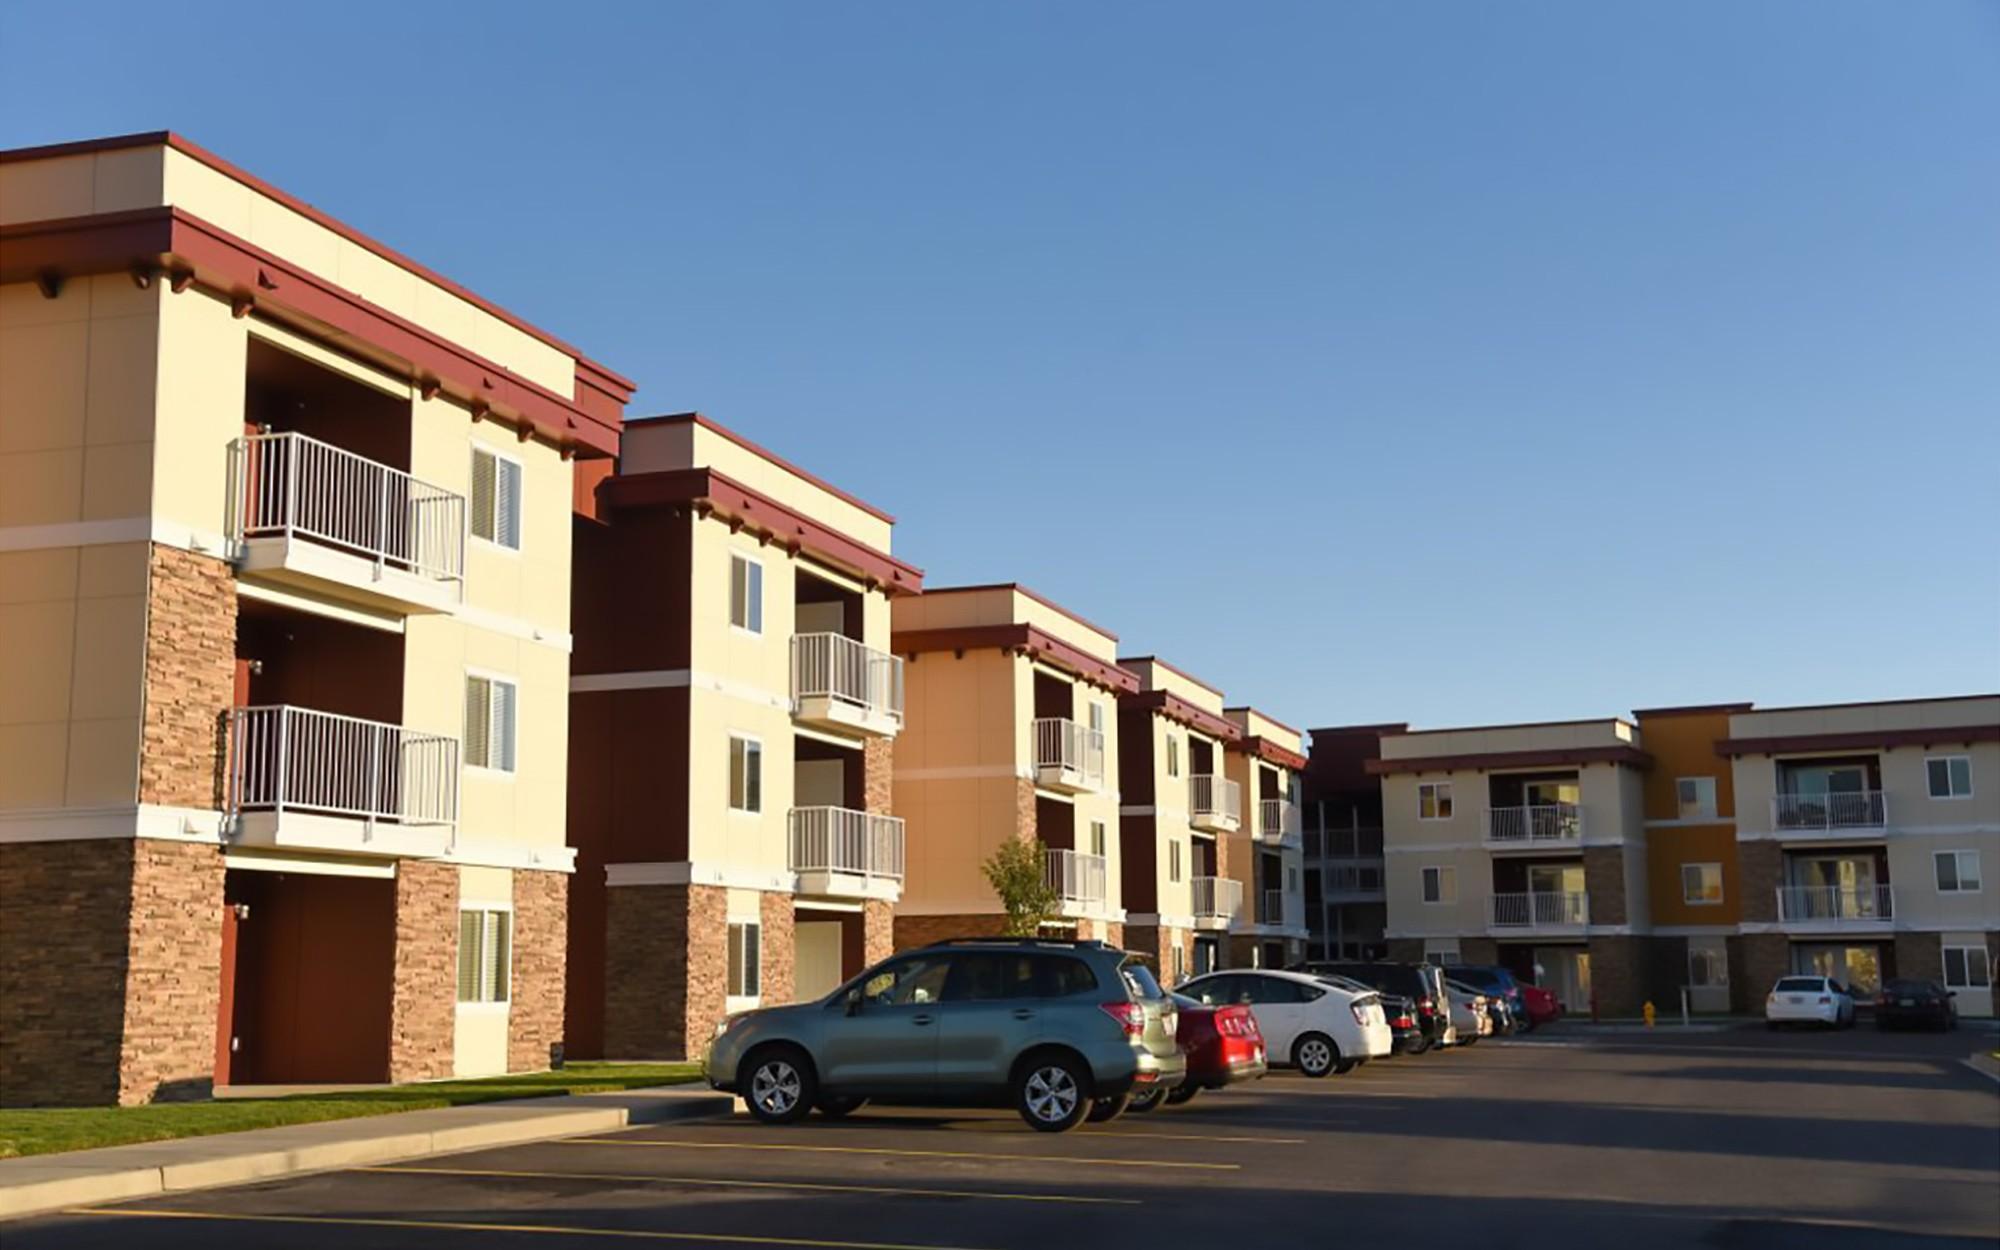 43423219620 784a73067c k 1024x684 copy - Multi-Family & Hospitality